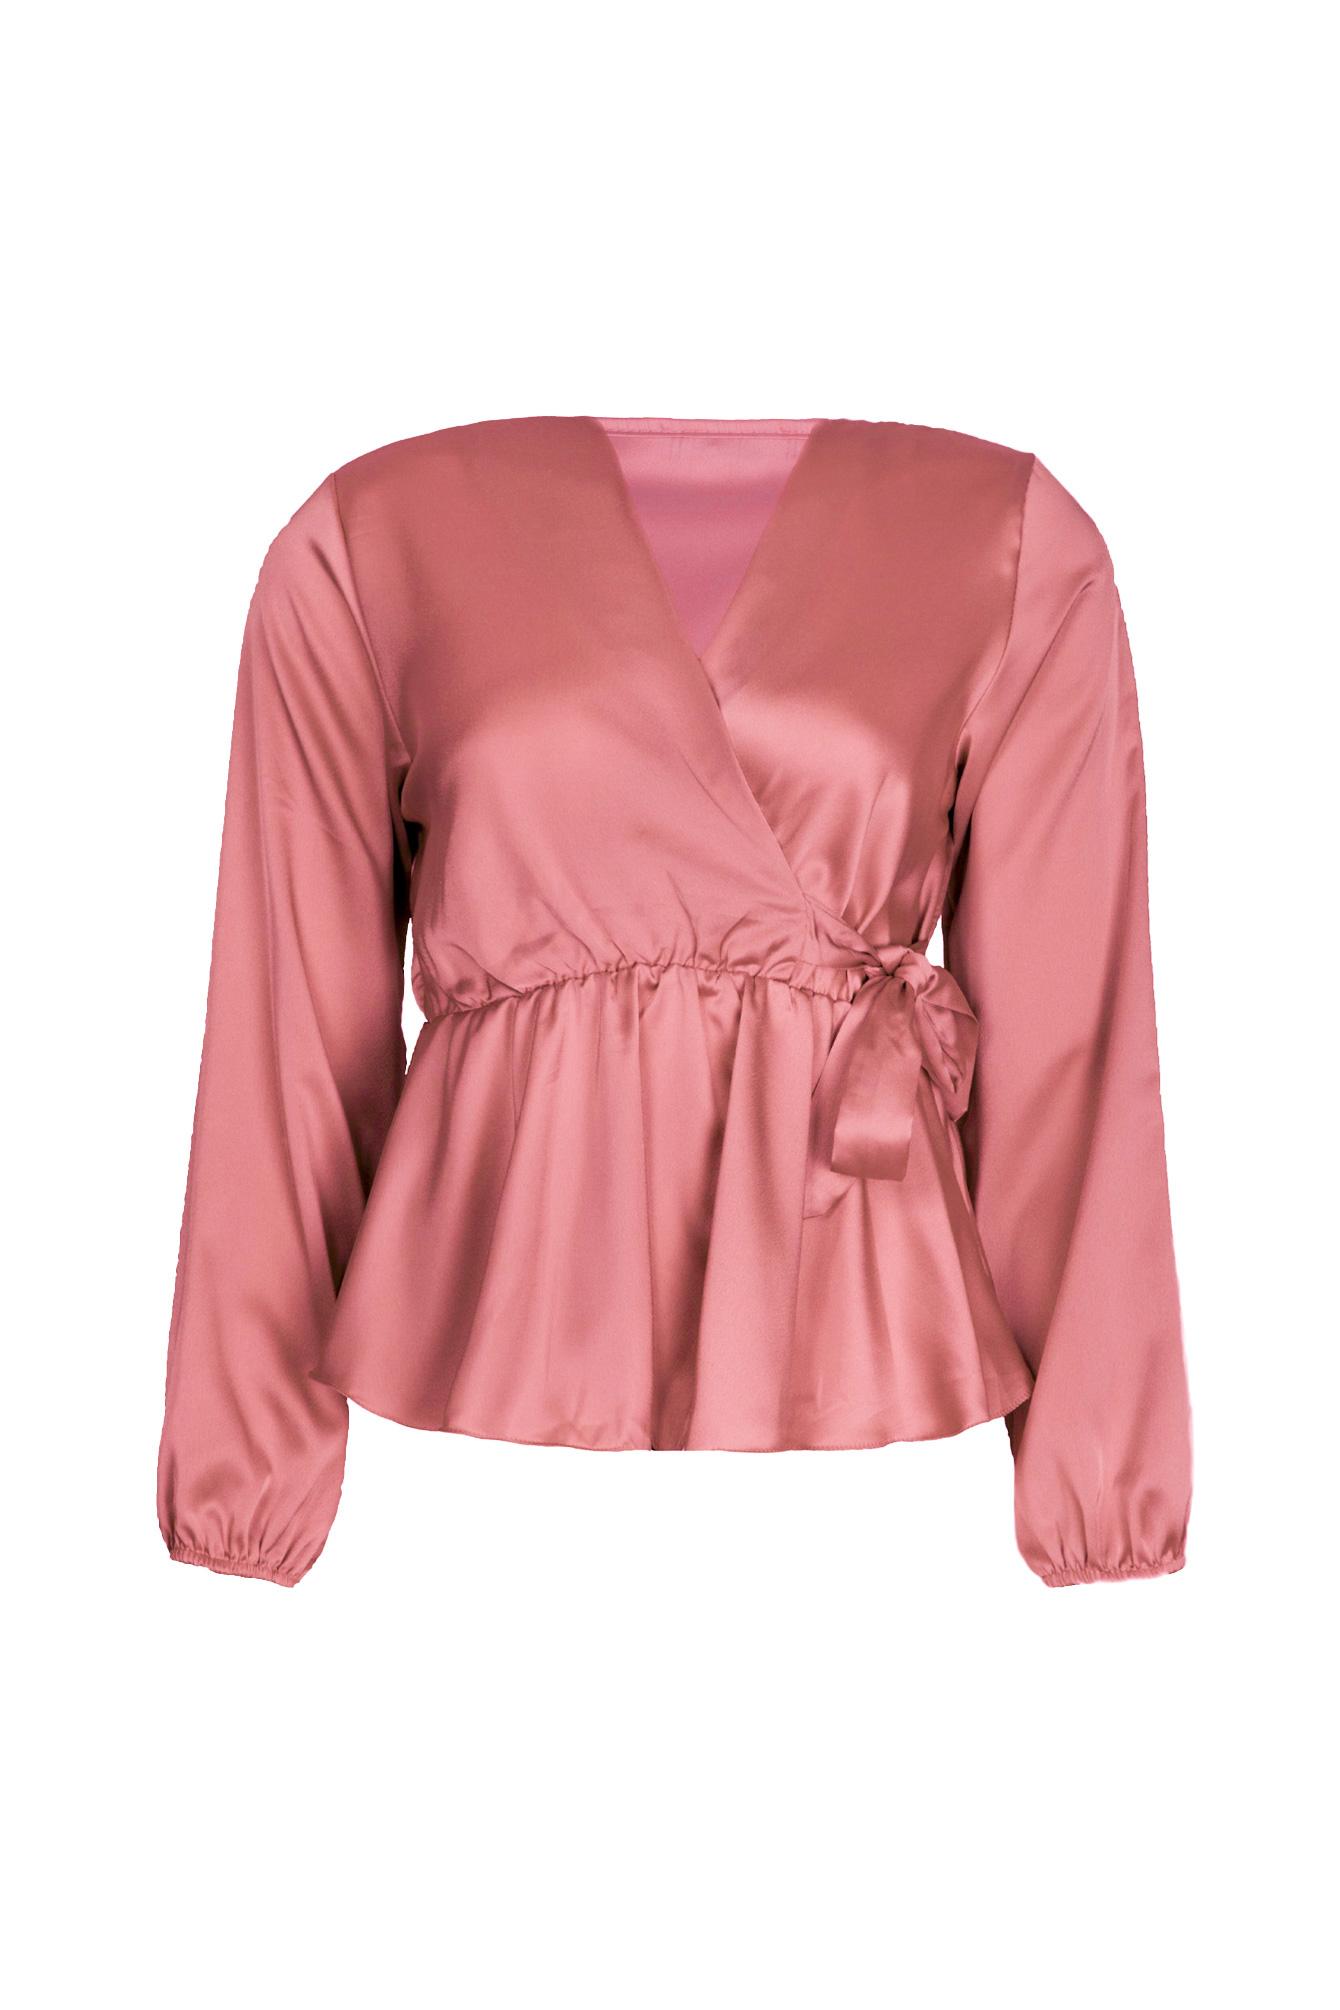 Blouse satin Avery pink